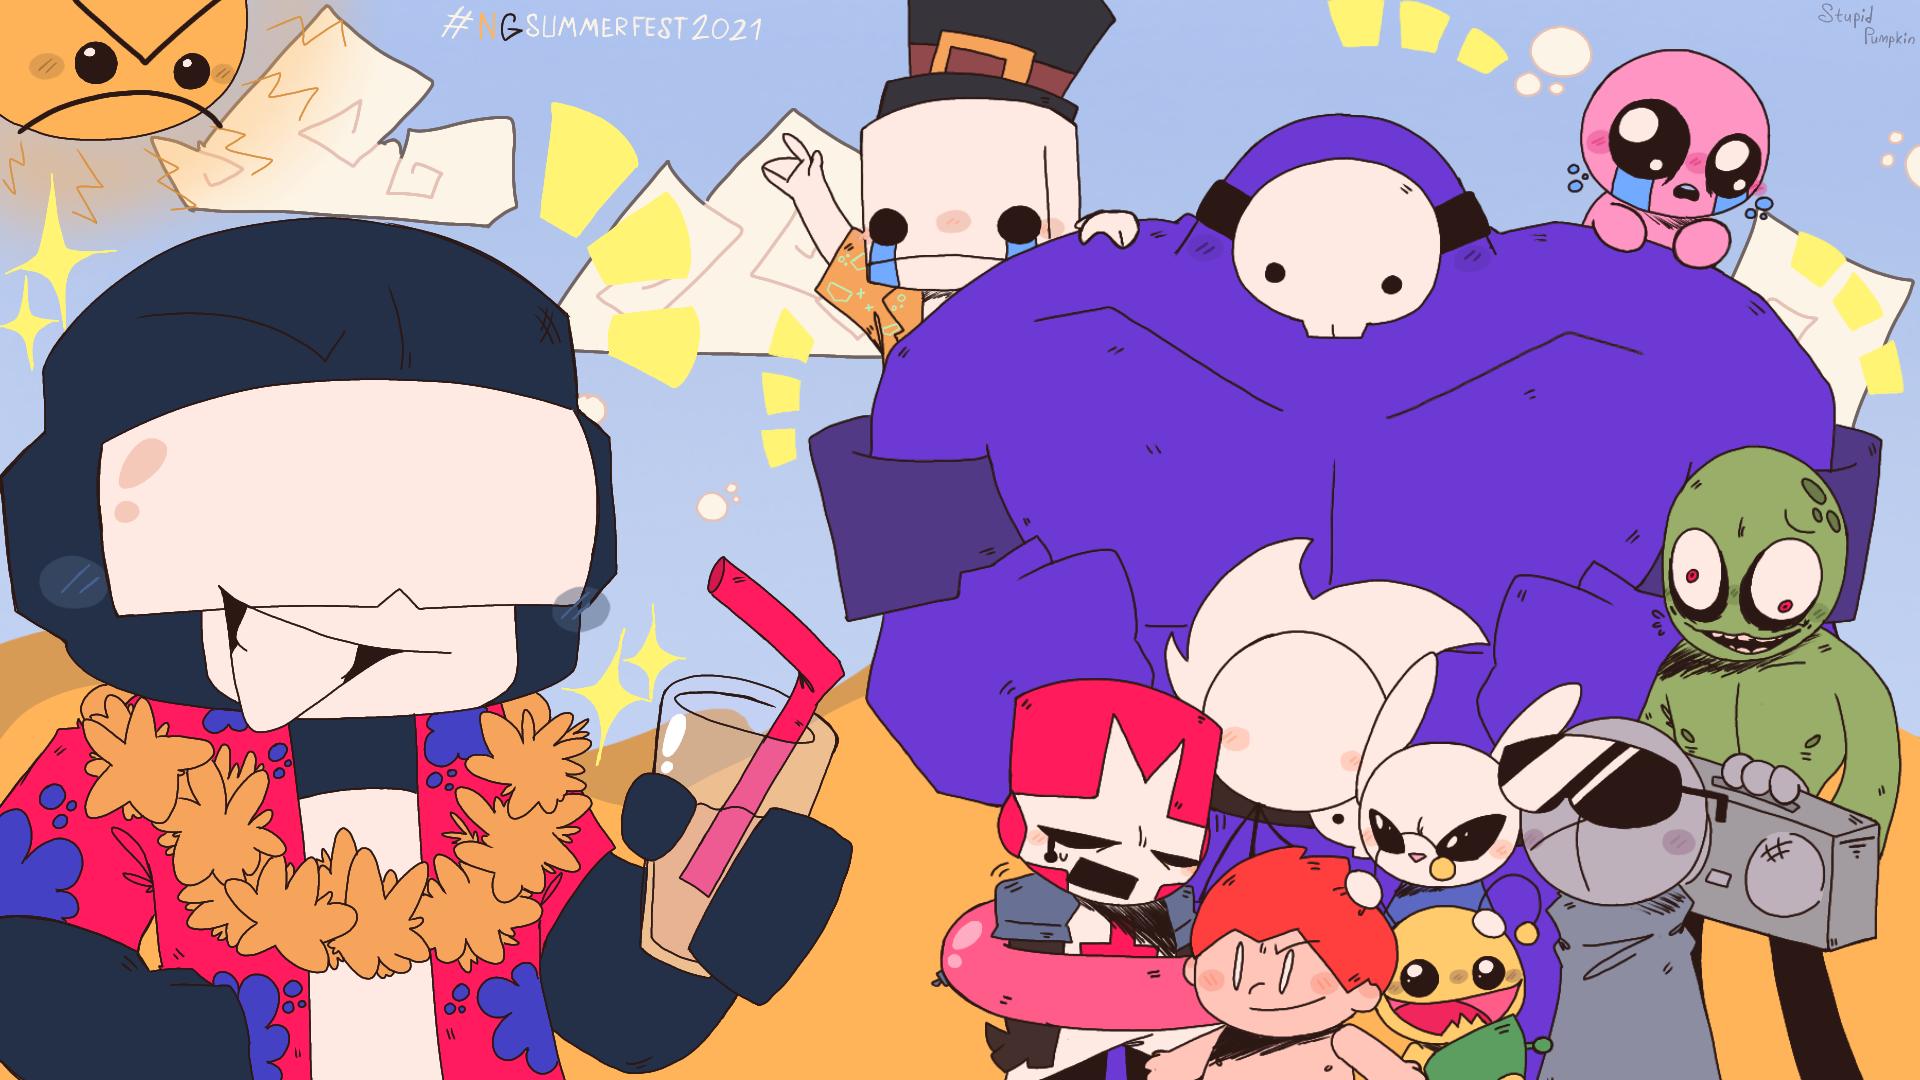 NG Summer Festival!!!